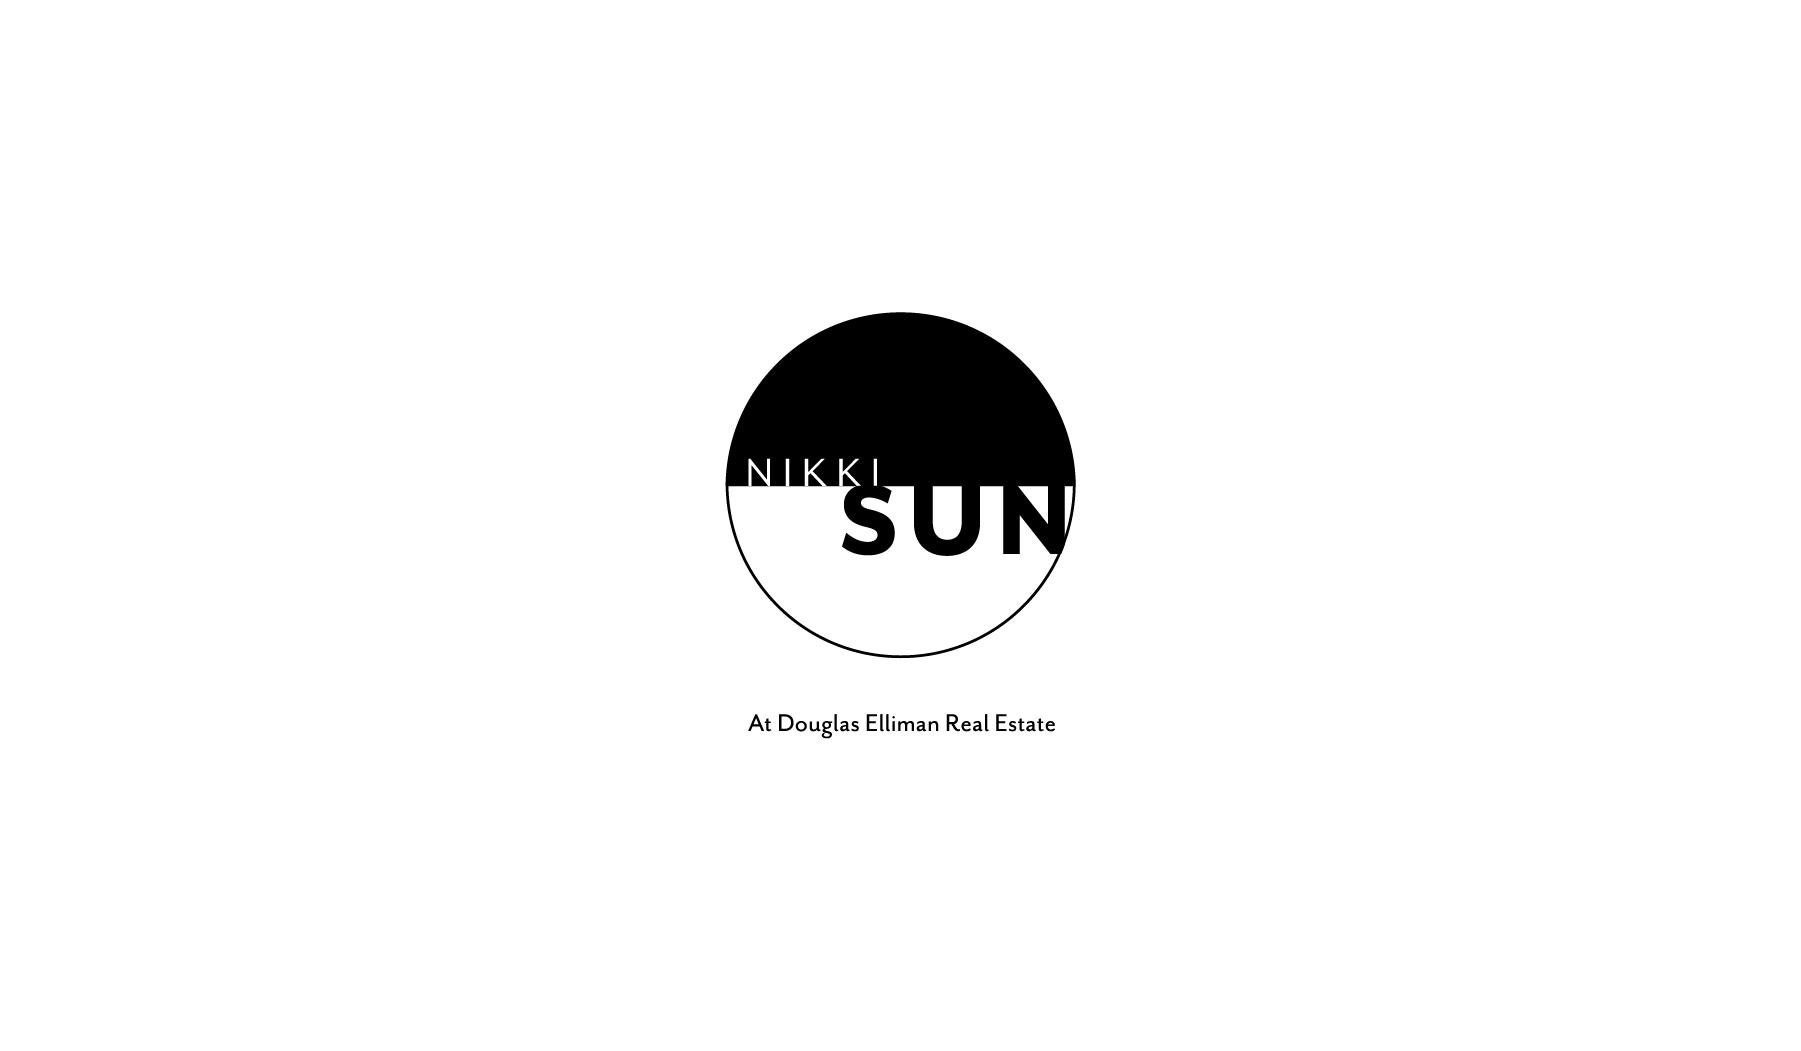 logo compilation-21.jpg